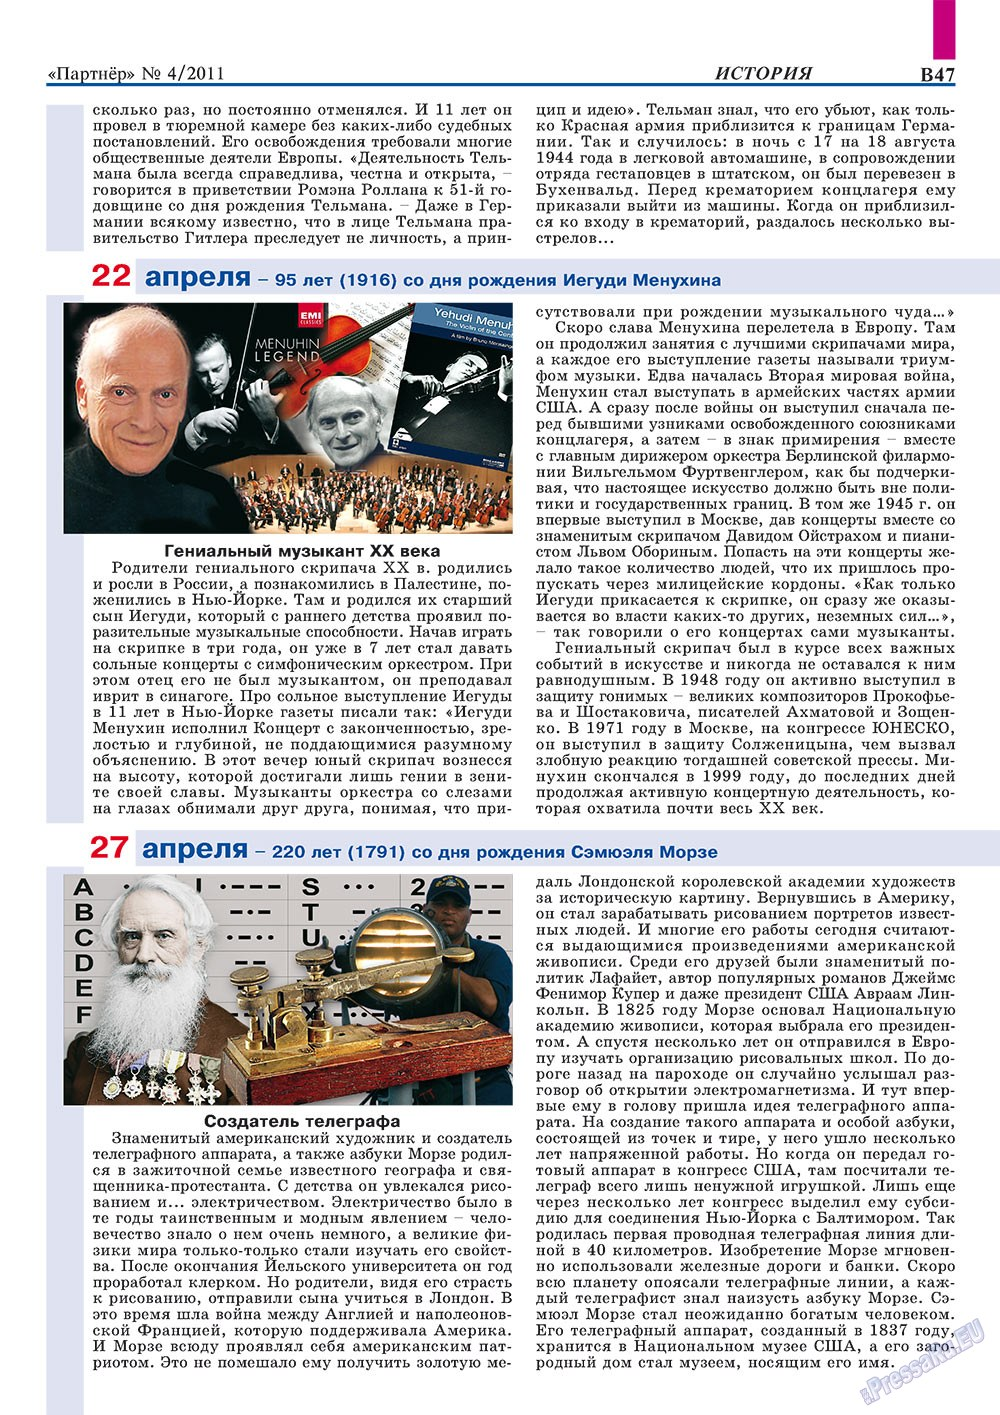 Партнер-север (журнал). 2011 год, номер 4, стр. 57